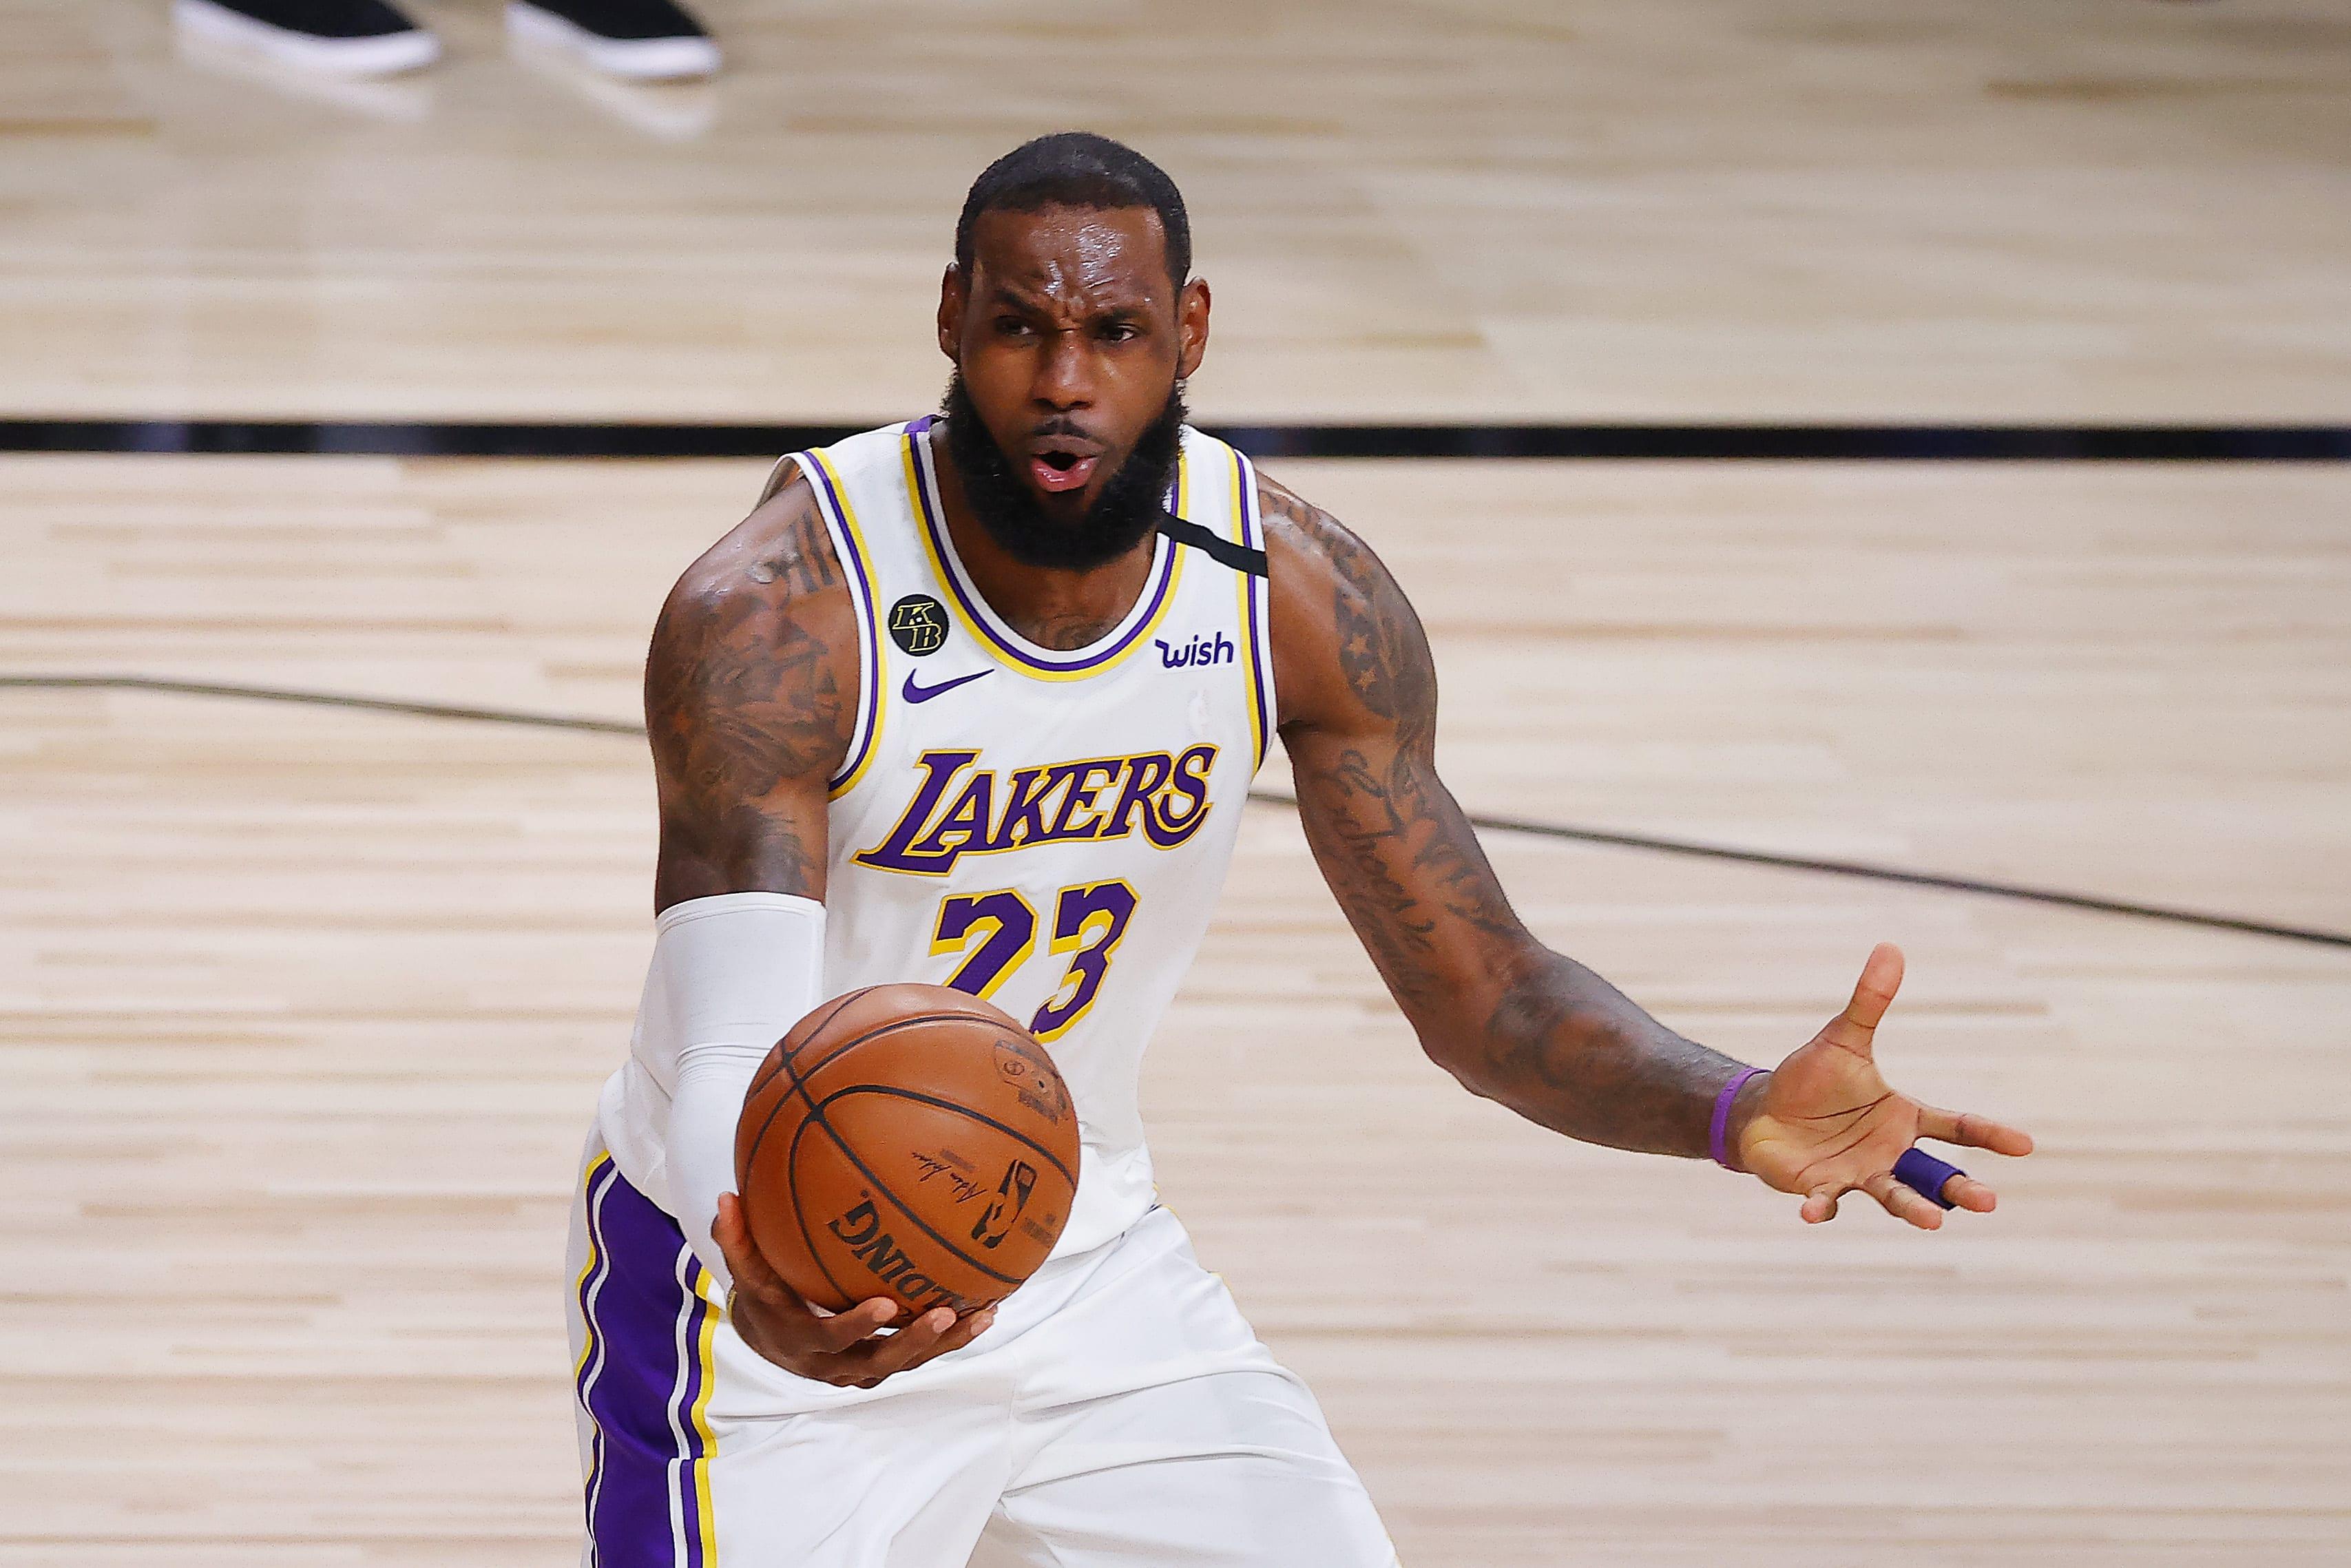 Nba Final Ratings Tank To Historic Lows Despite Lebron James Lakers Observer